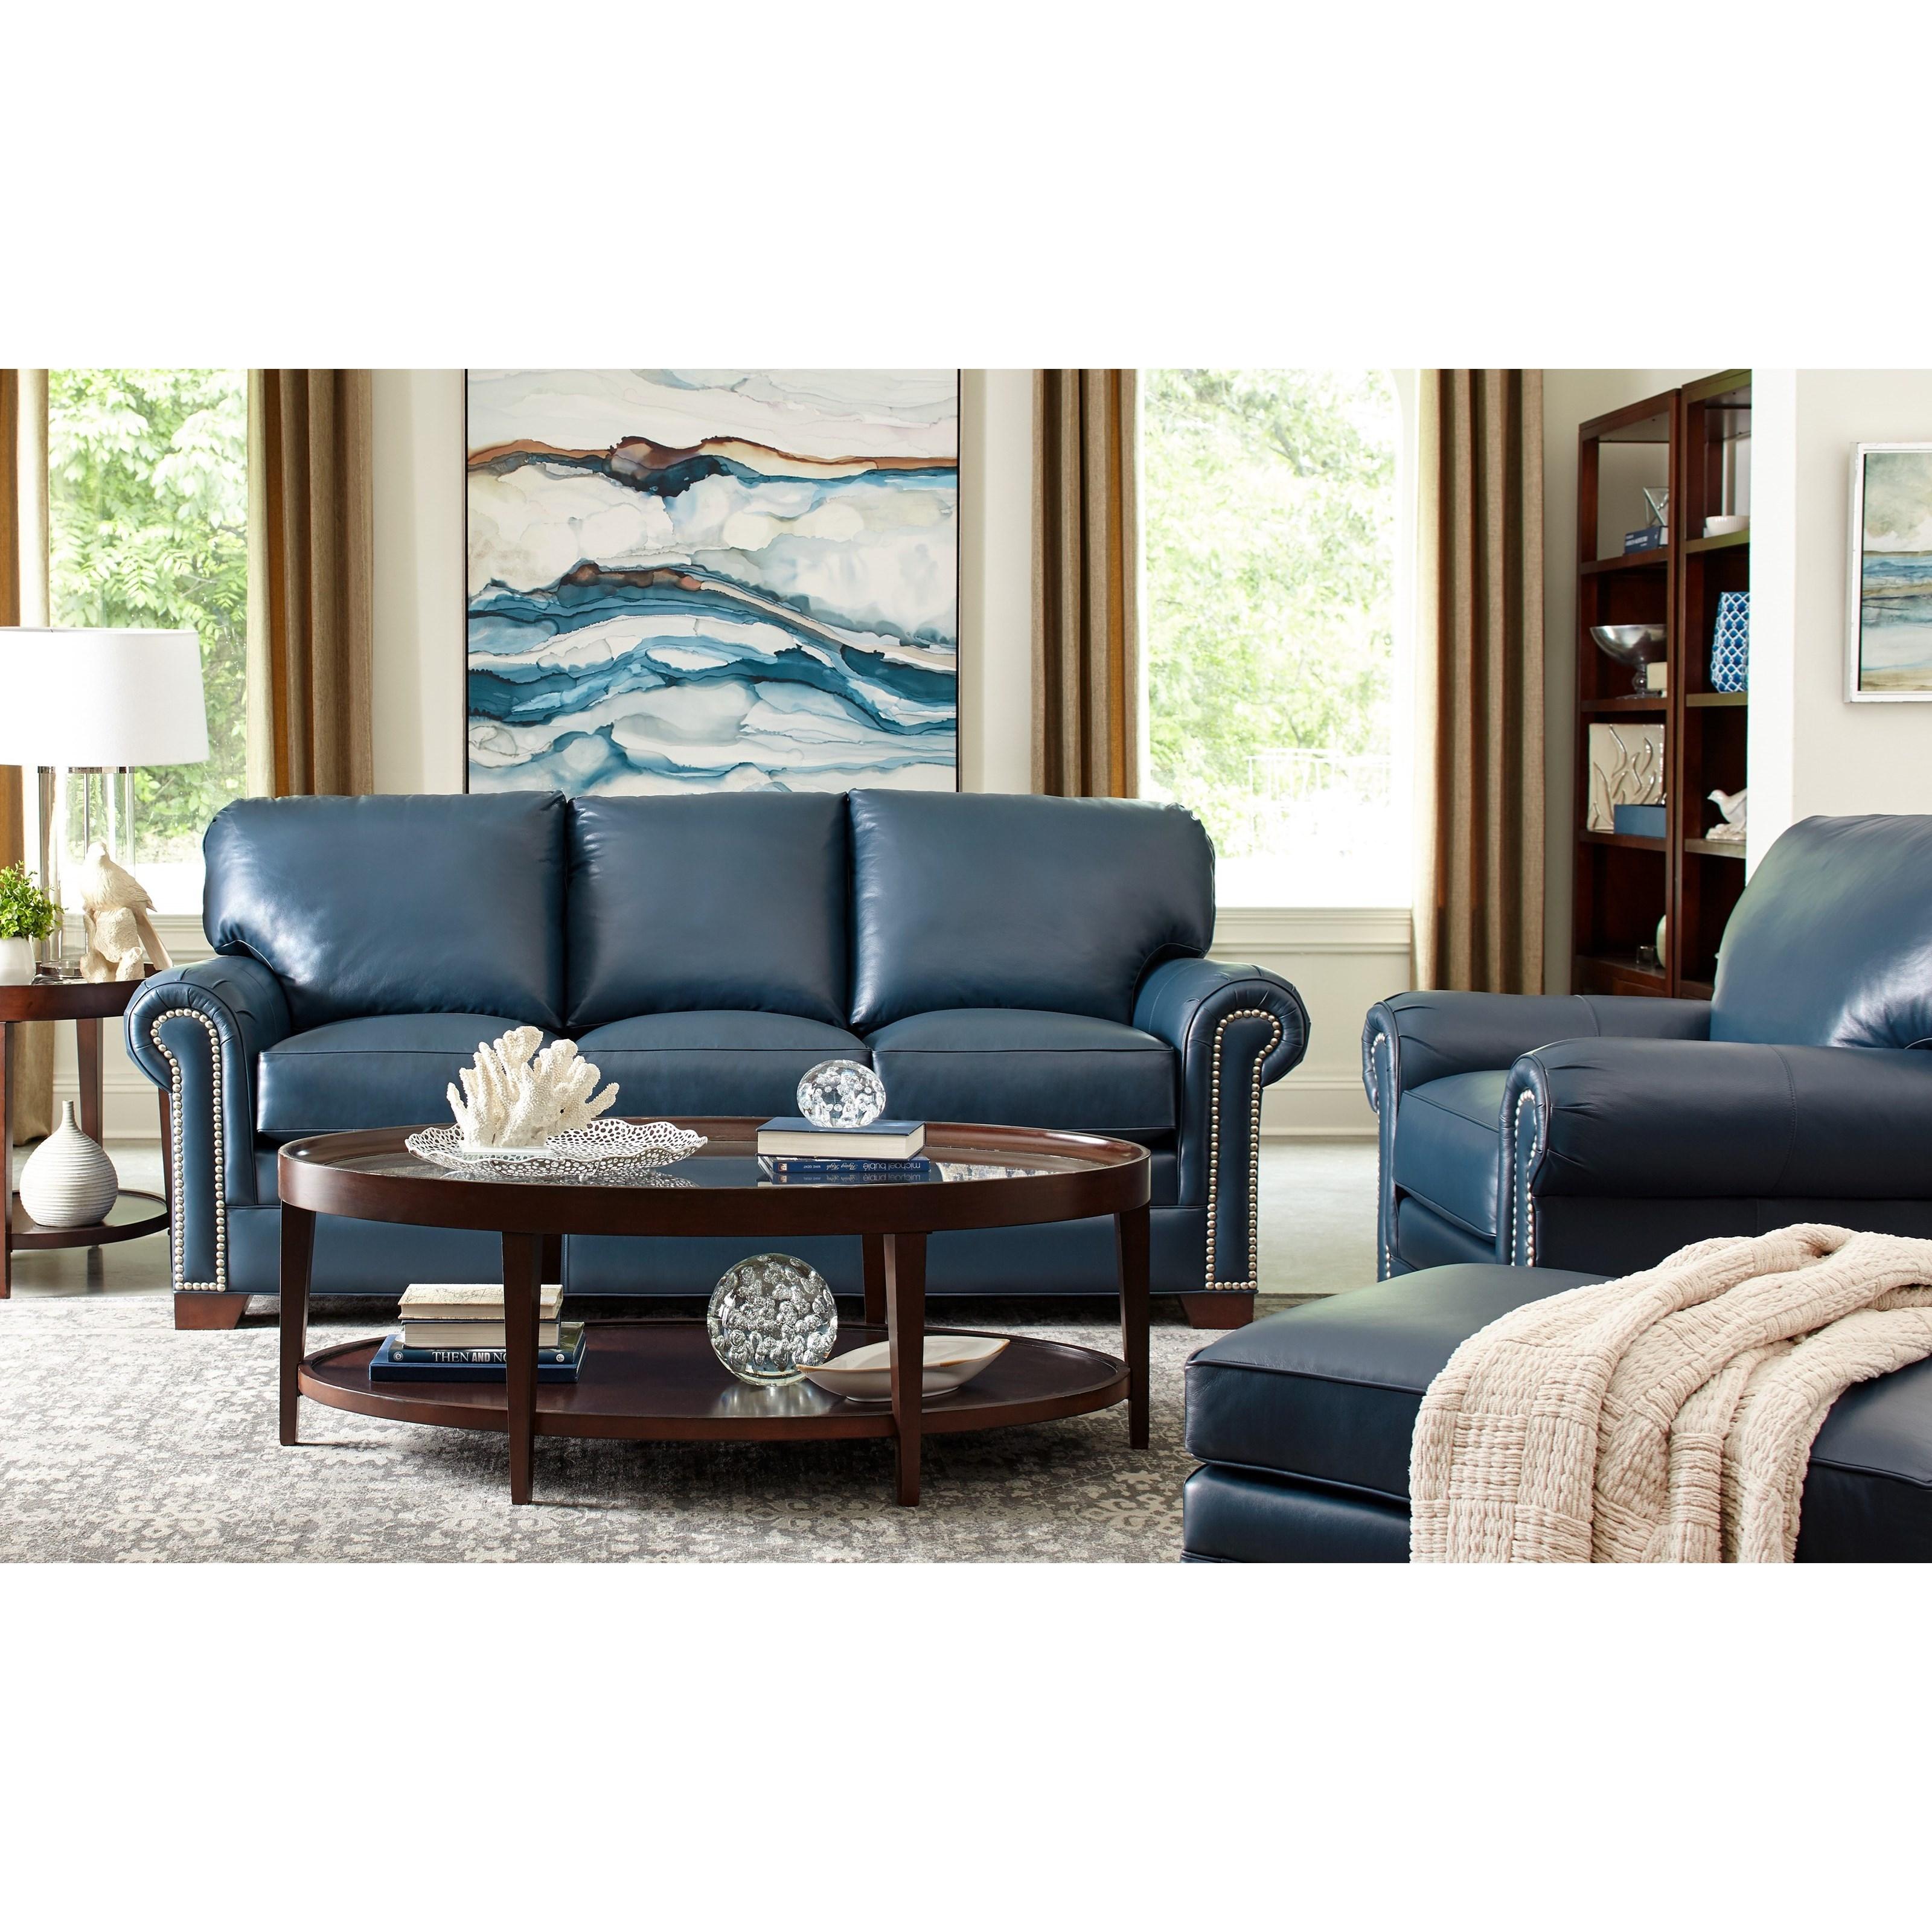 L756550 Living Room Group by Craftmaster at Bullard Furniture